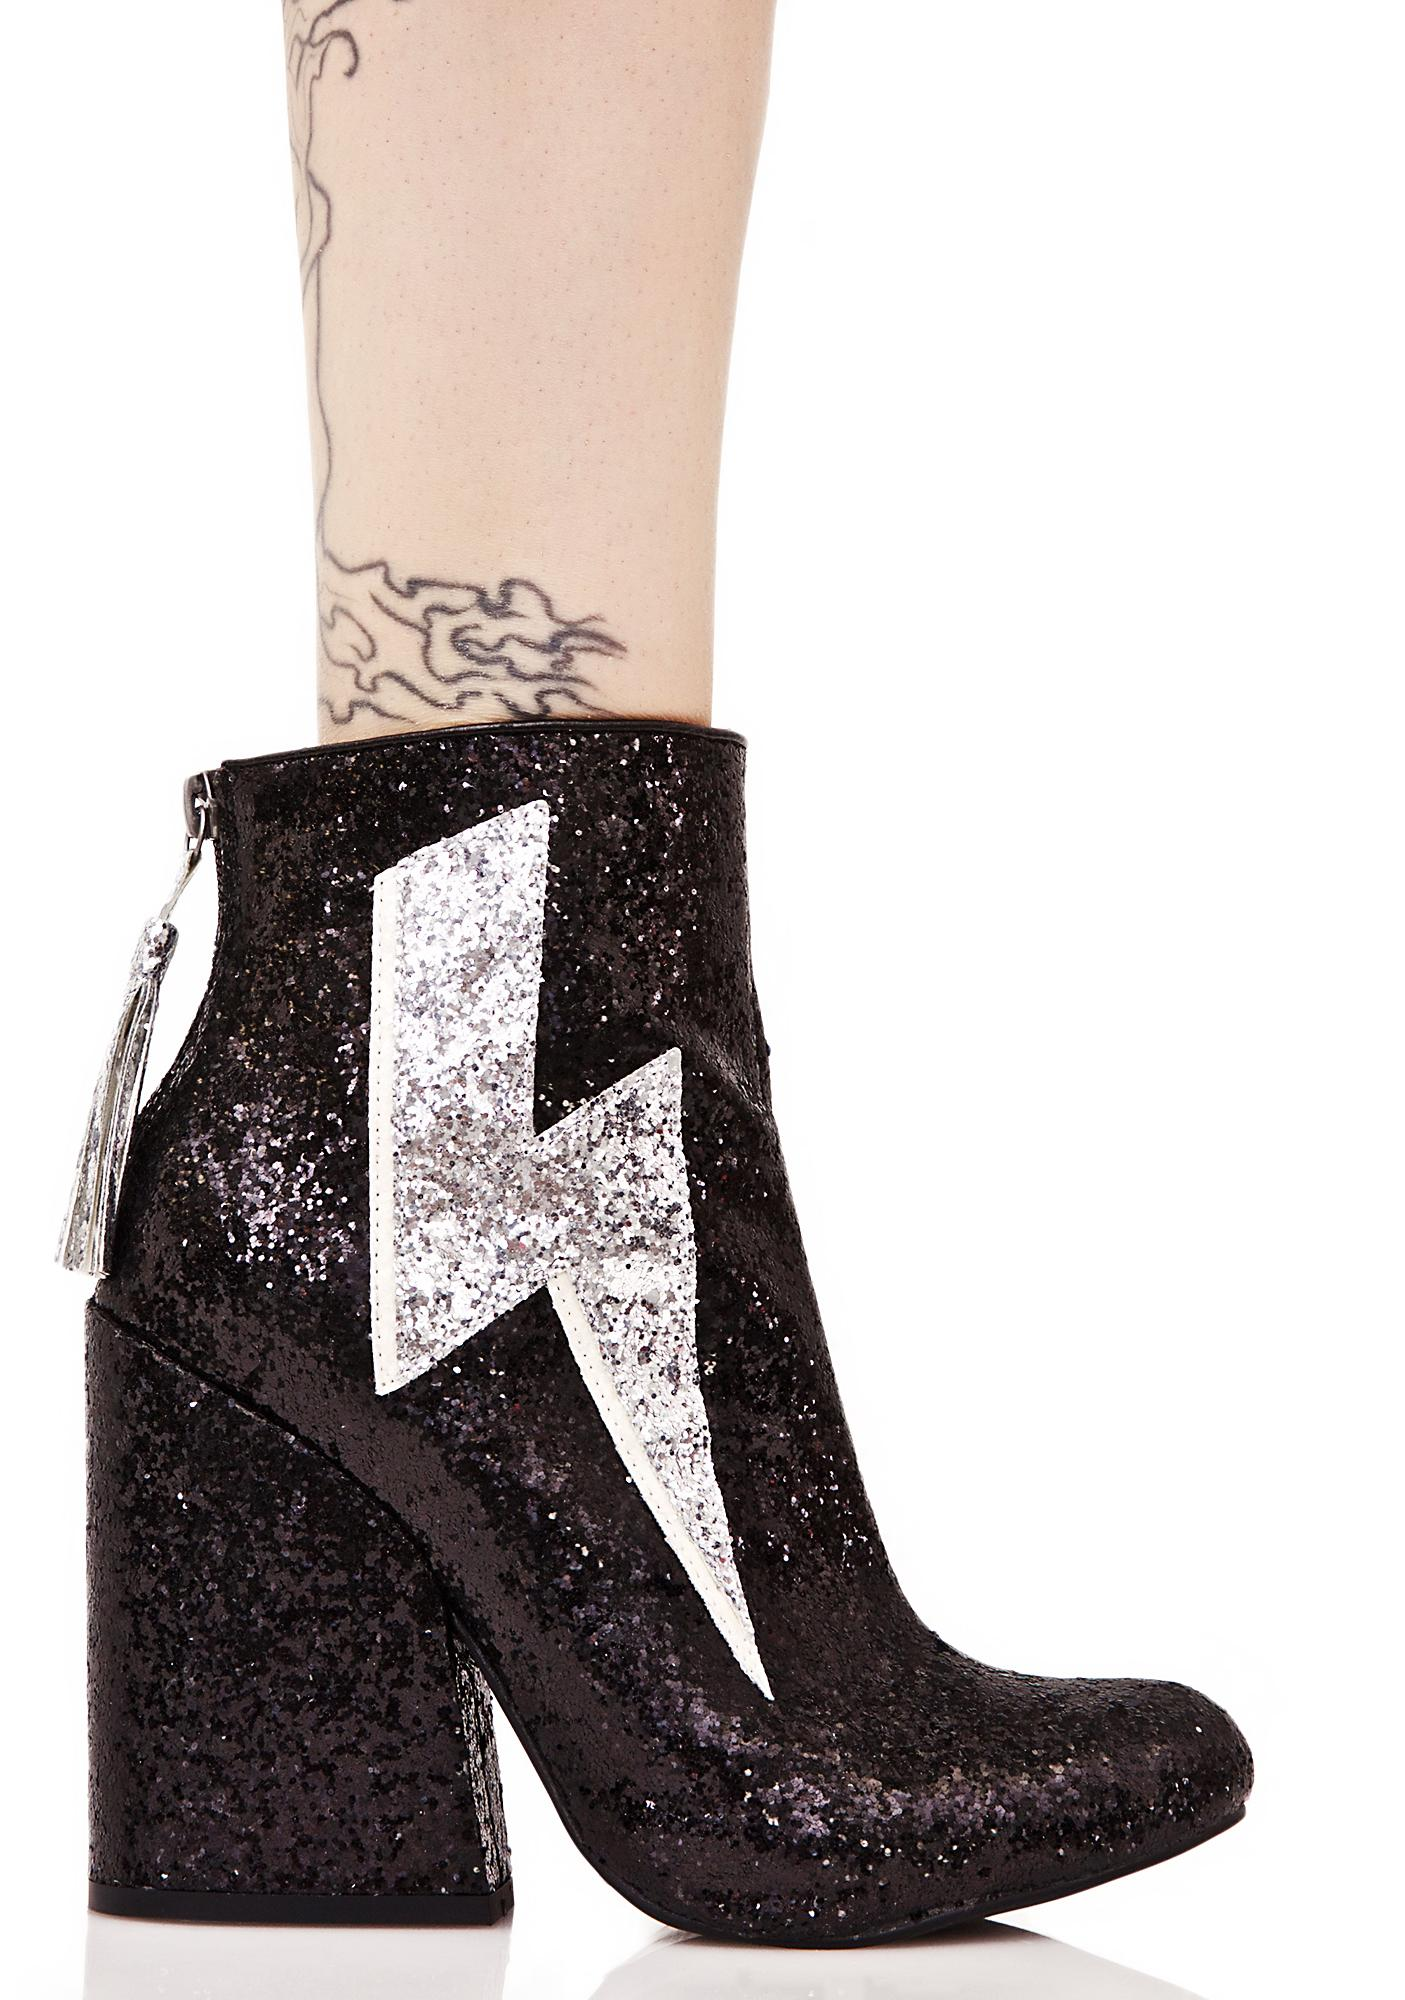 Y.R.U. Ziggy Sparkle Lightning Boots